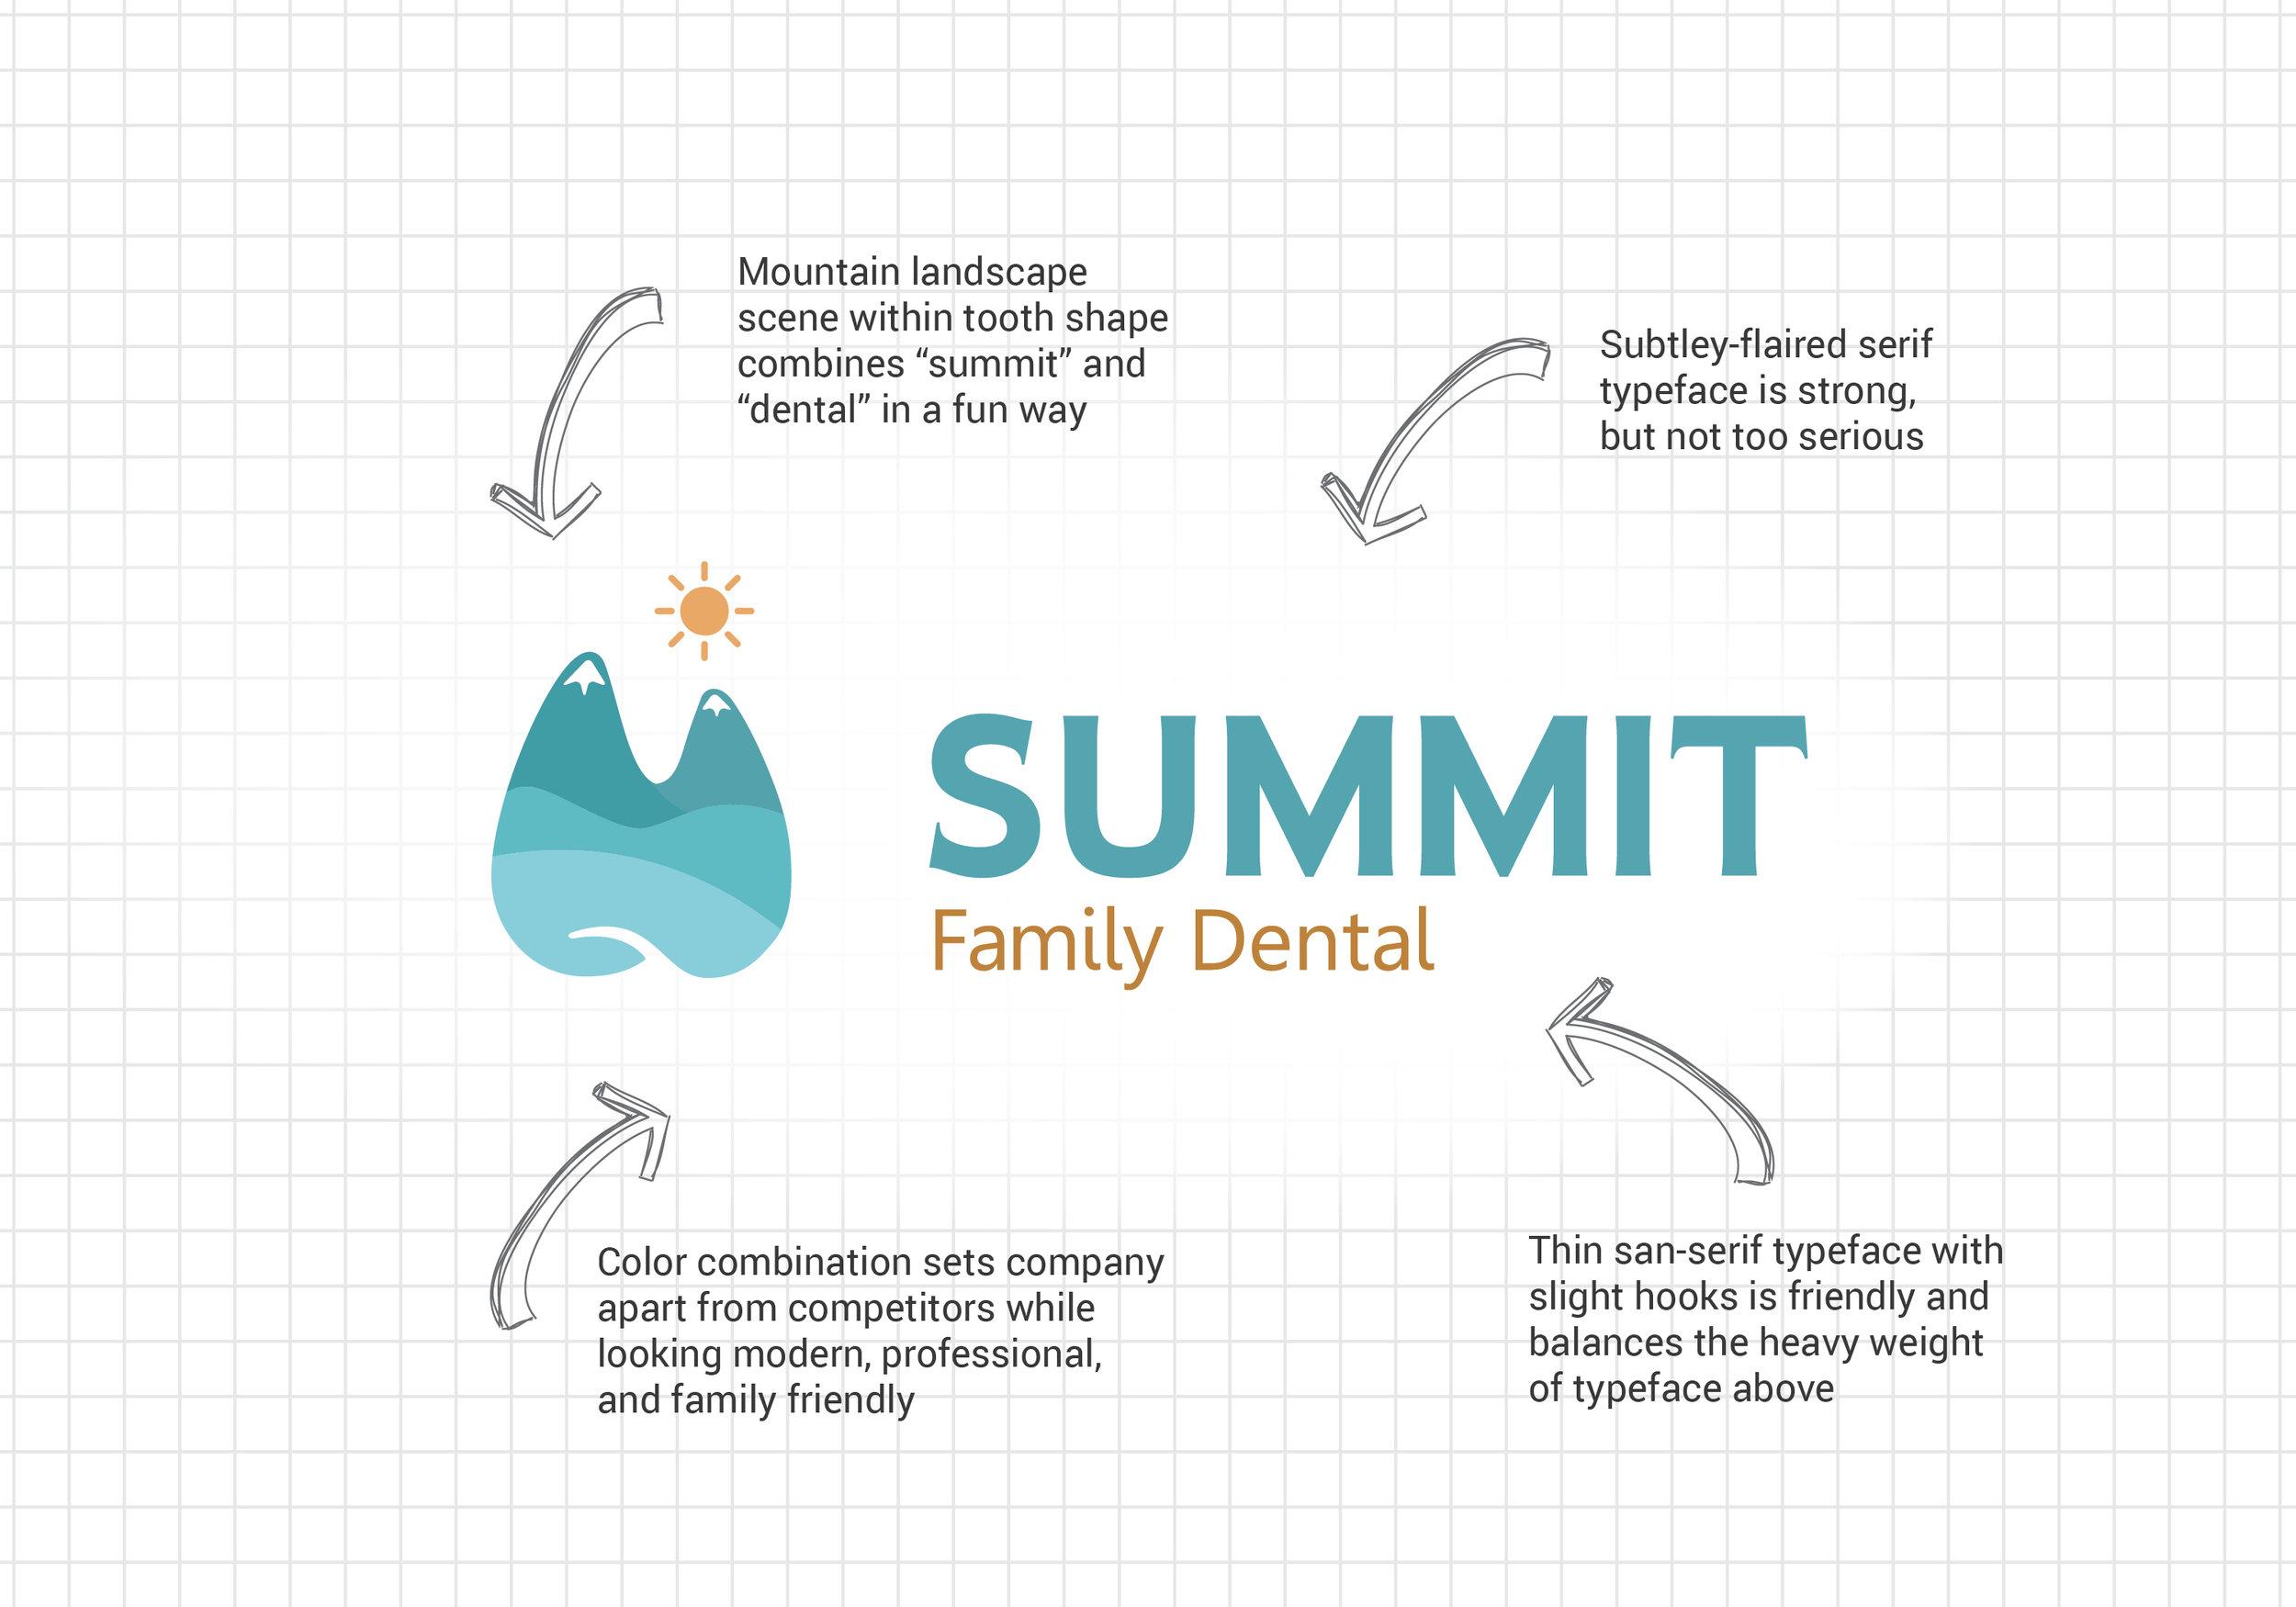 Anatomy of the Summit Family Dental logo.